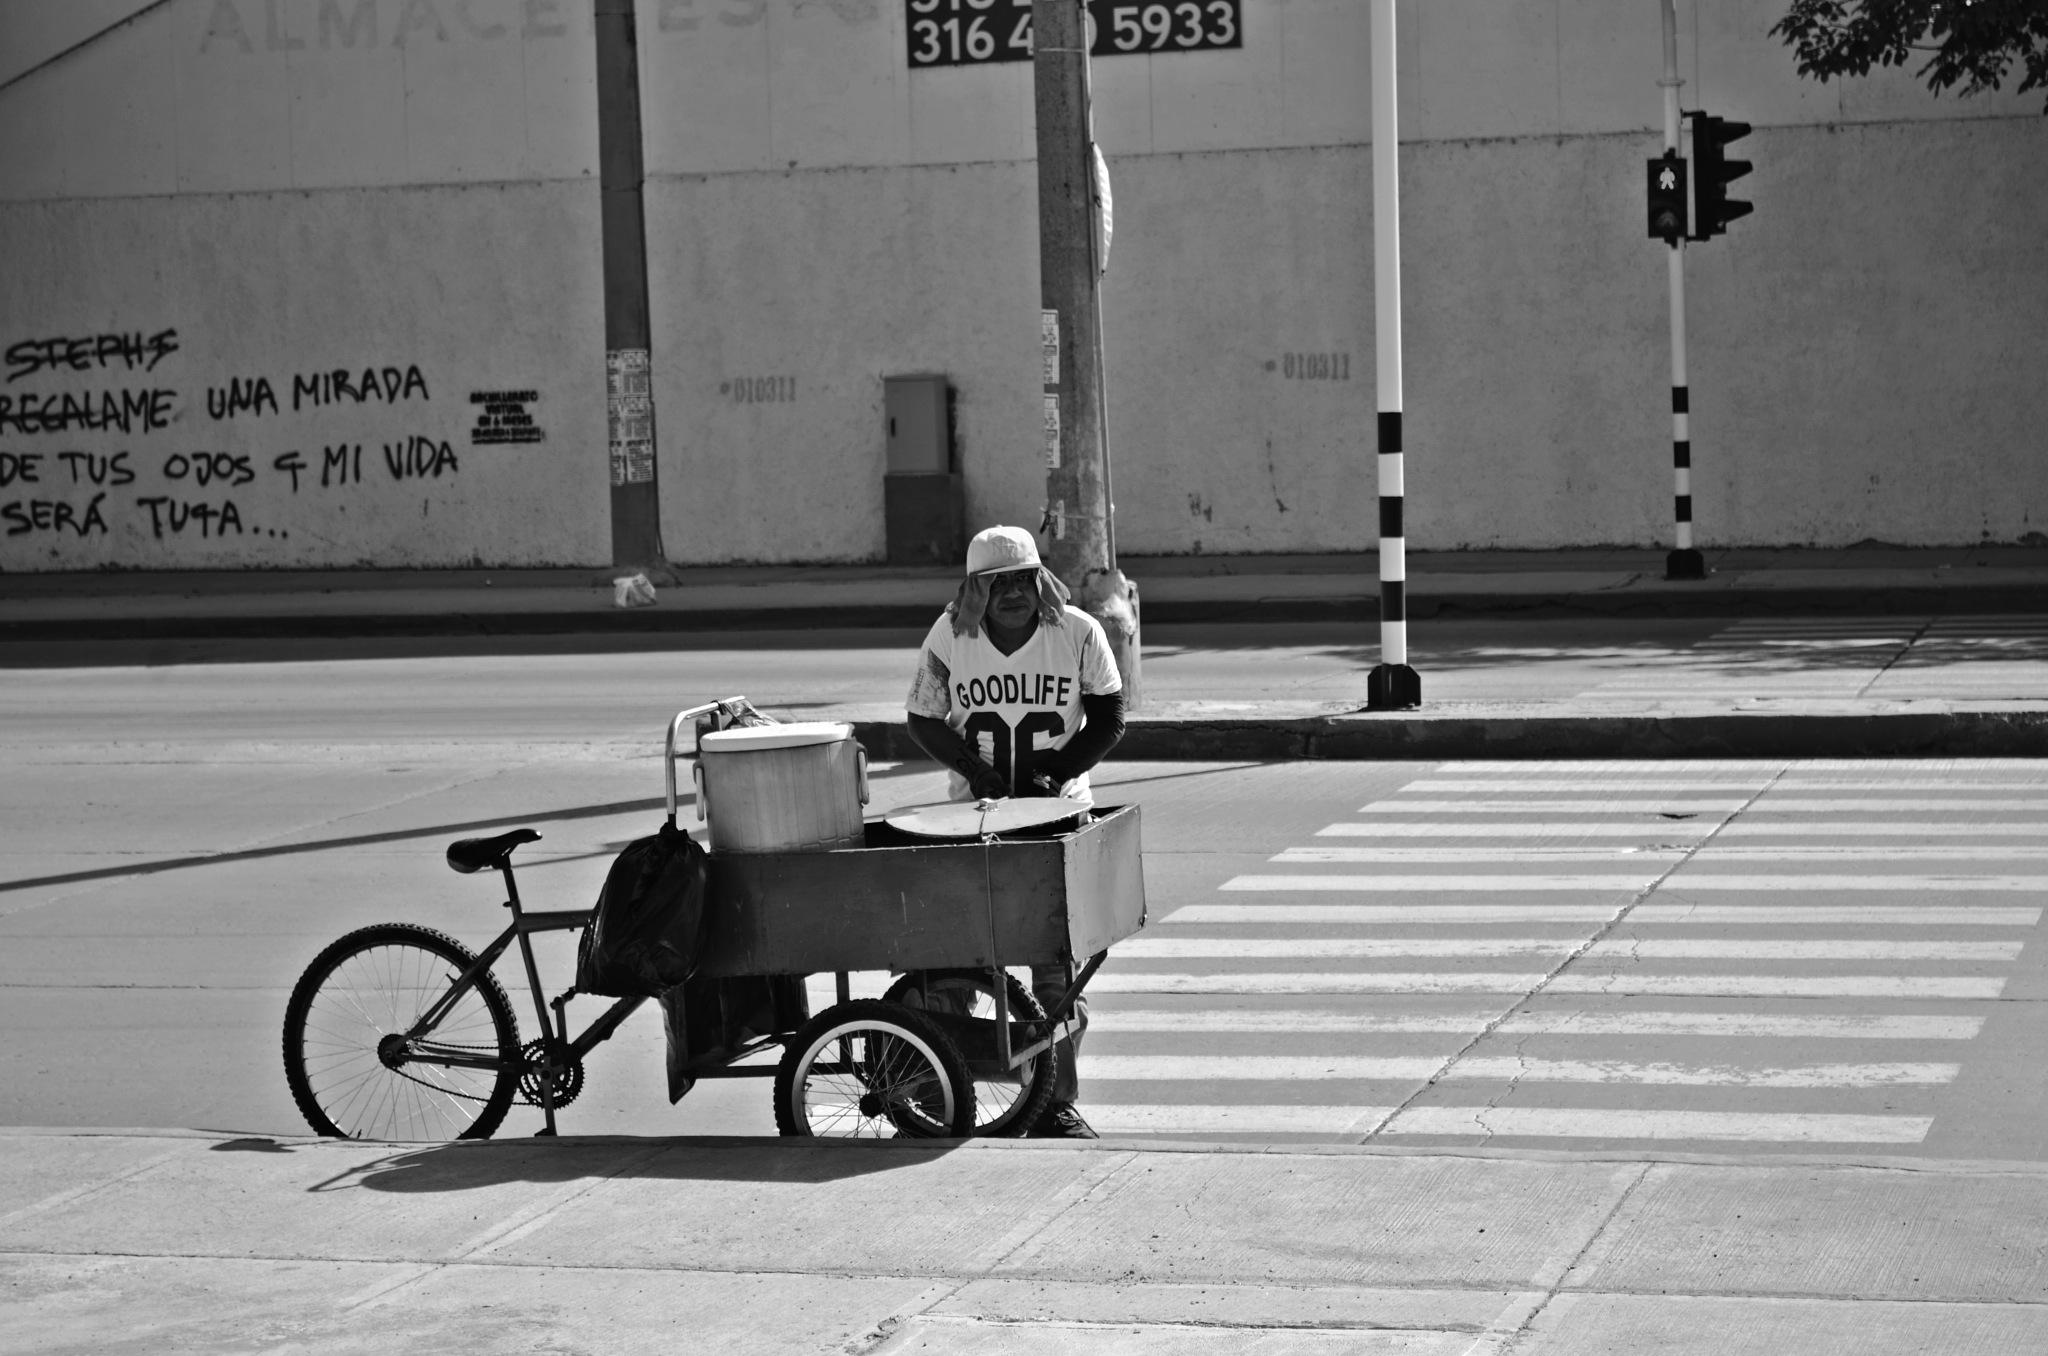 Street photo by VictorDelahoz